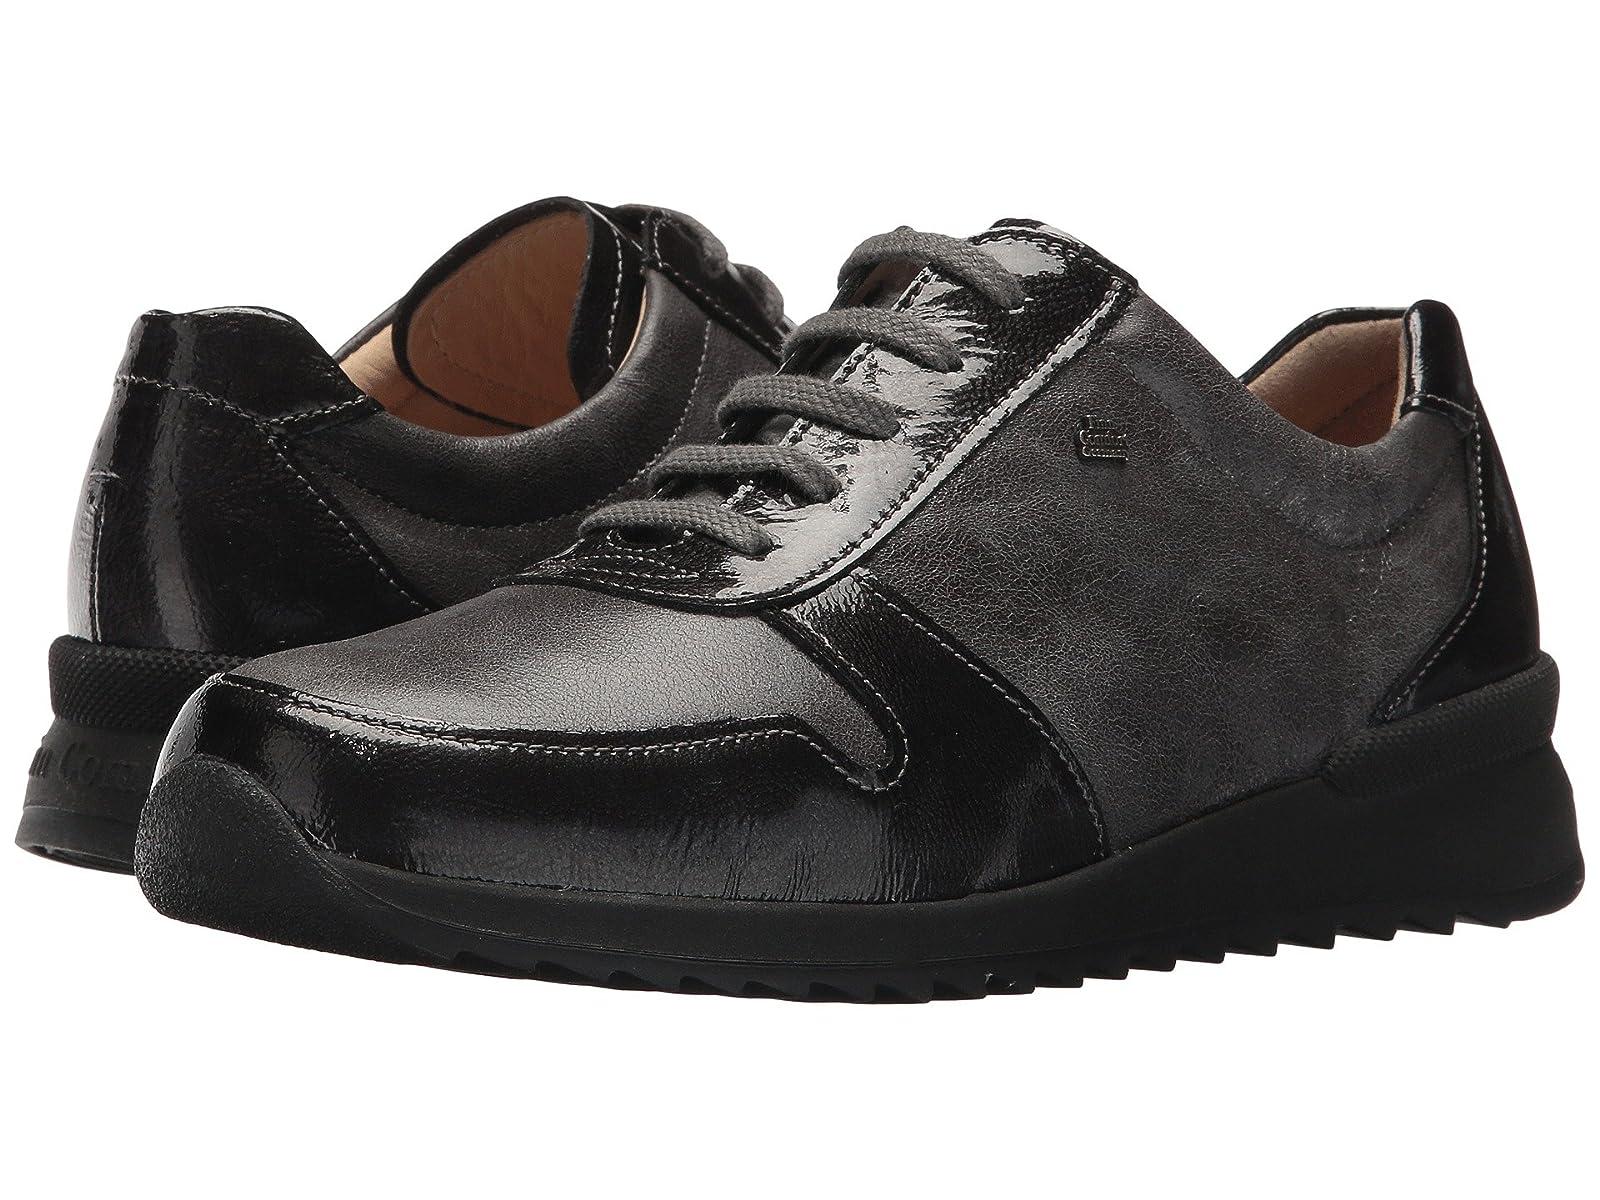 Finn Comfort Sidonia-SCheap and distinctive eye-catching shoes